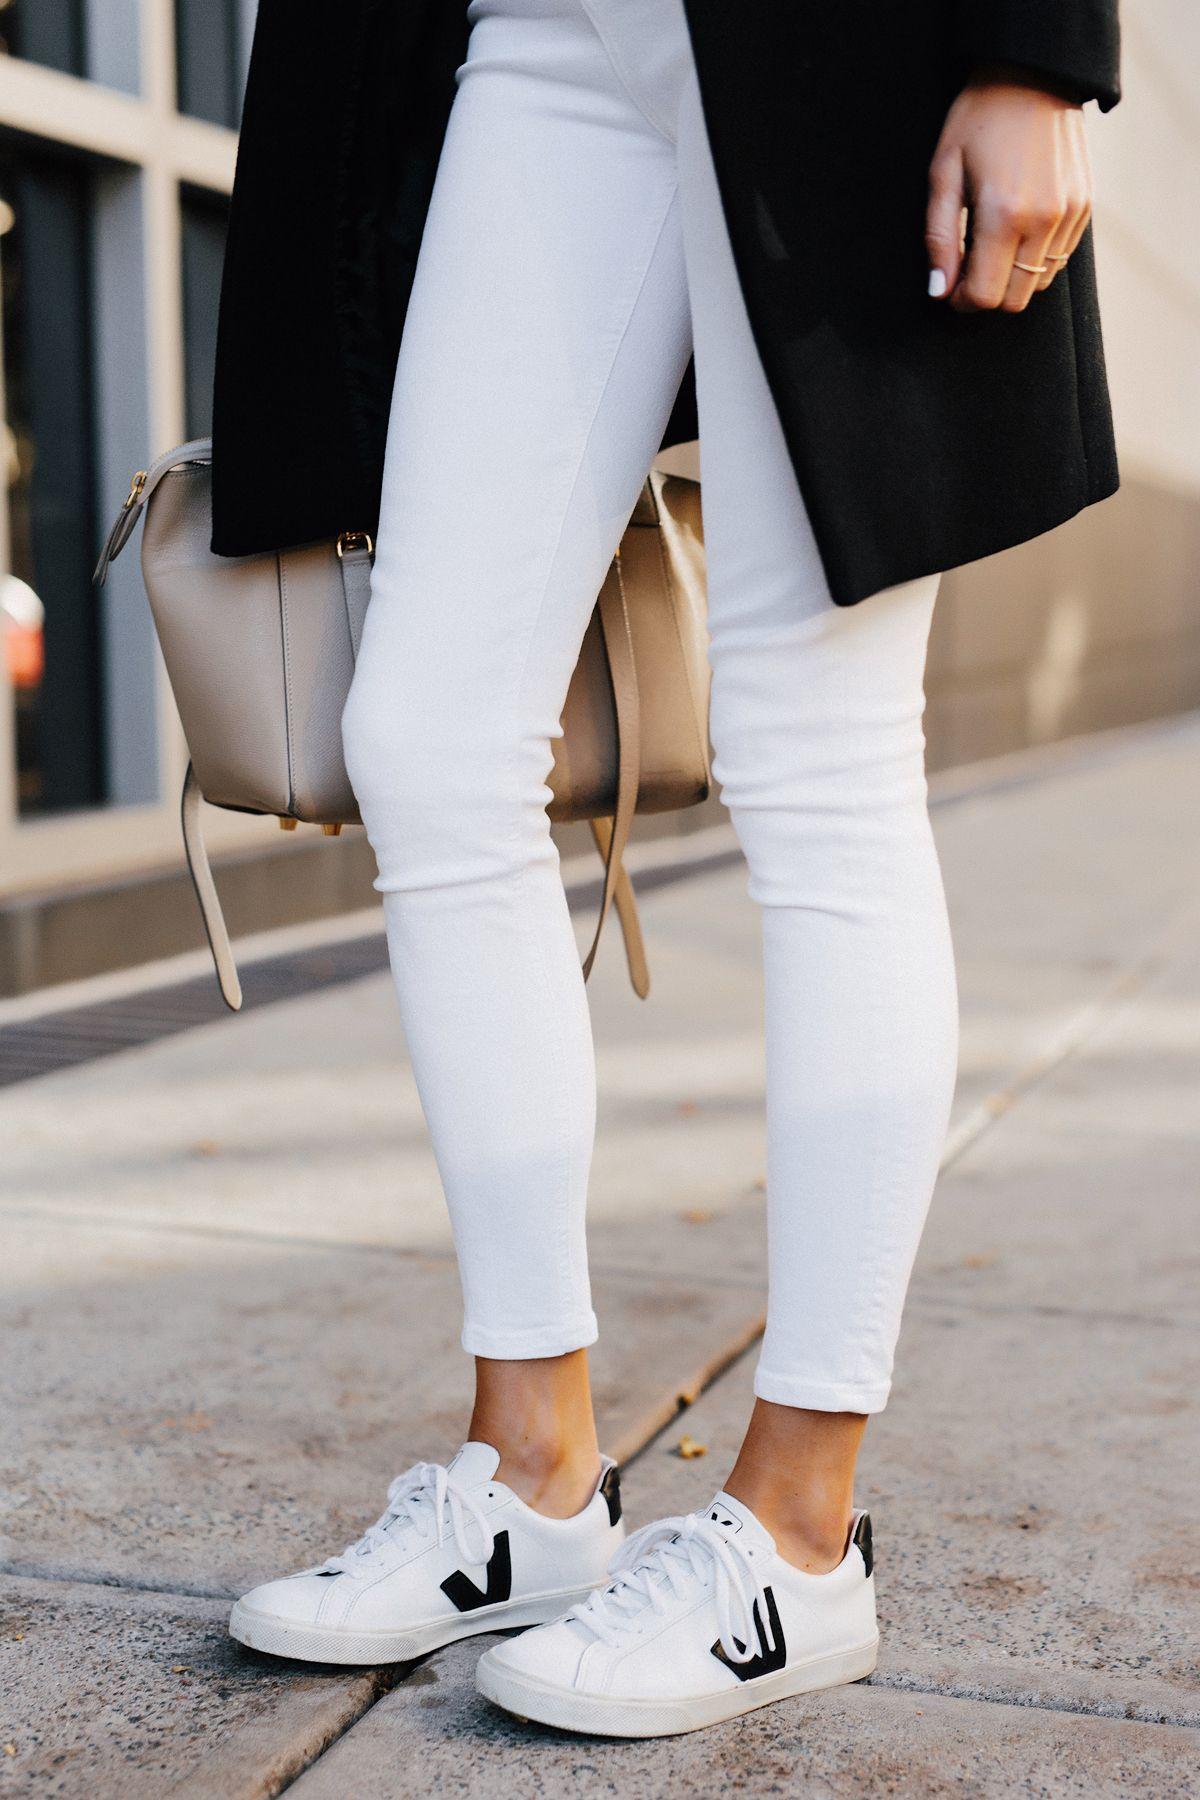 outlet store fantastic savings autumn shoes Woman Wearing White Skinny Jeans Veja Esplar White Sneakers ...